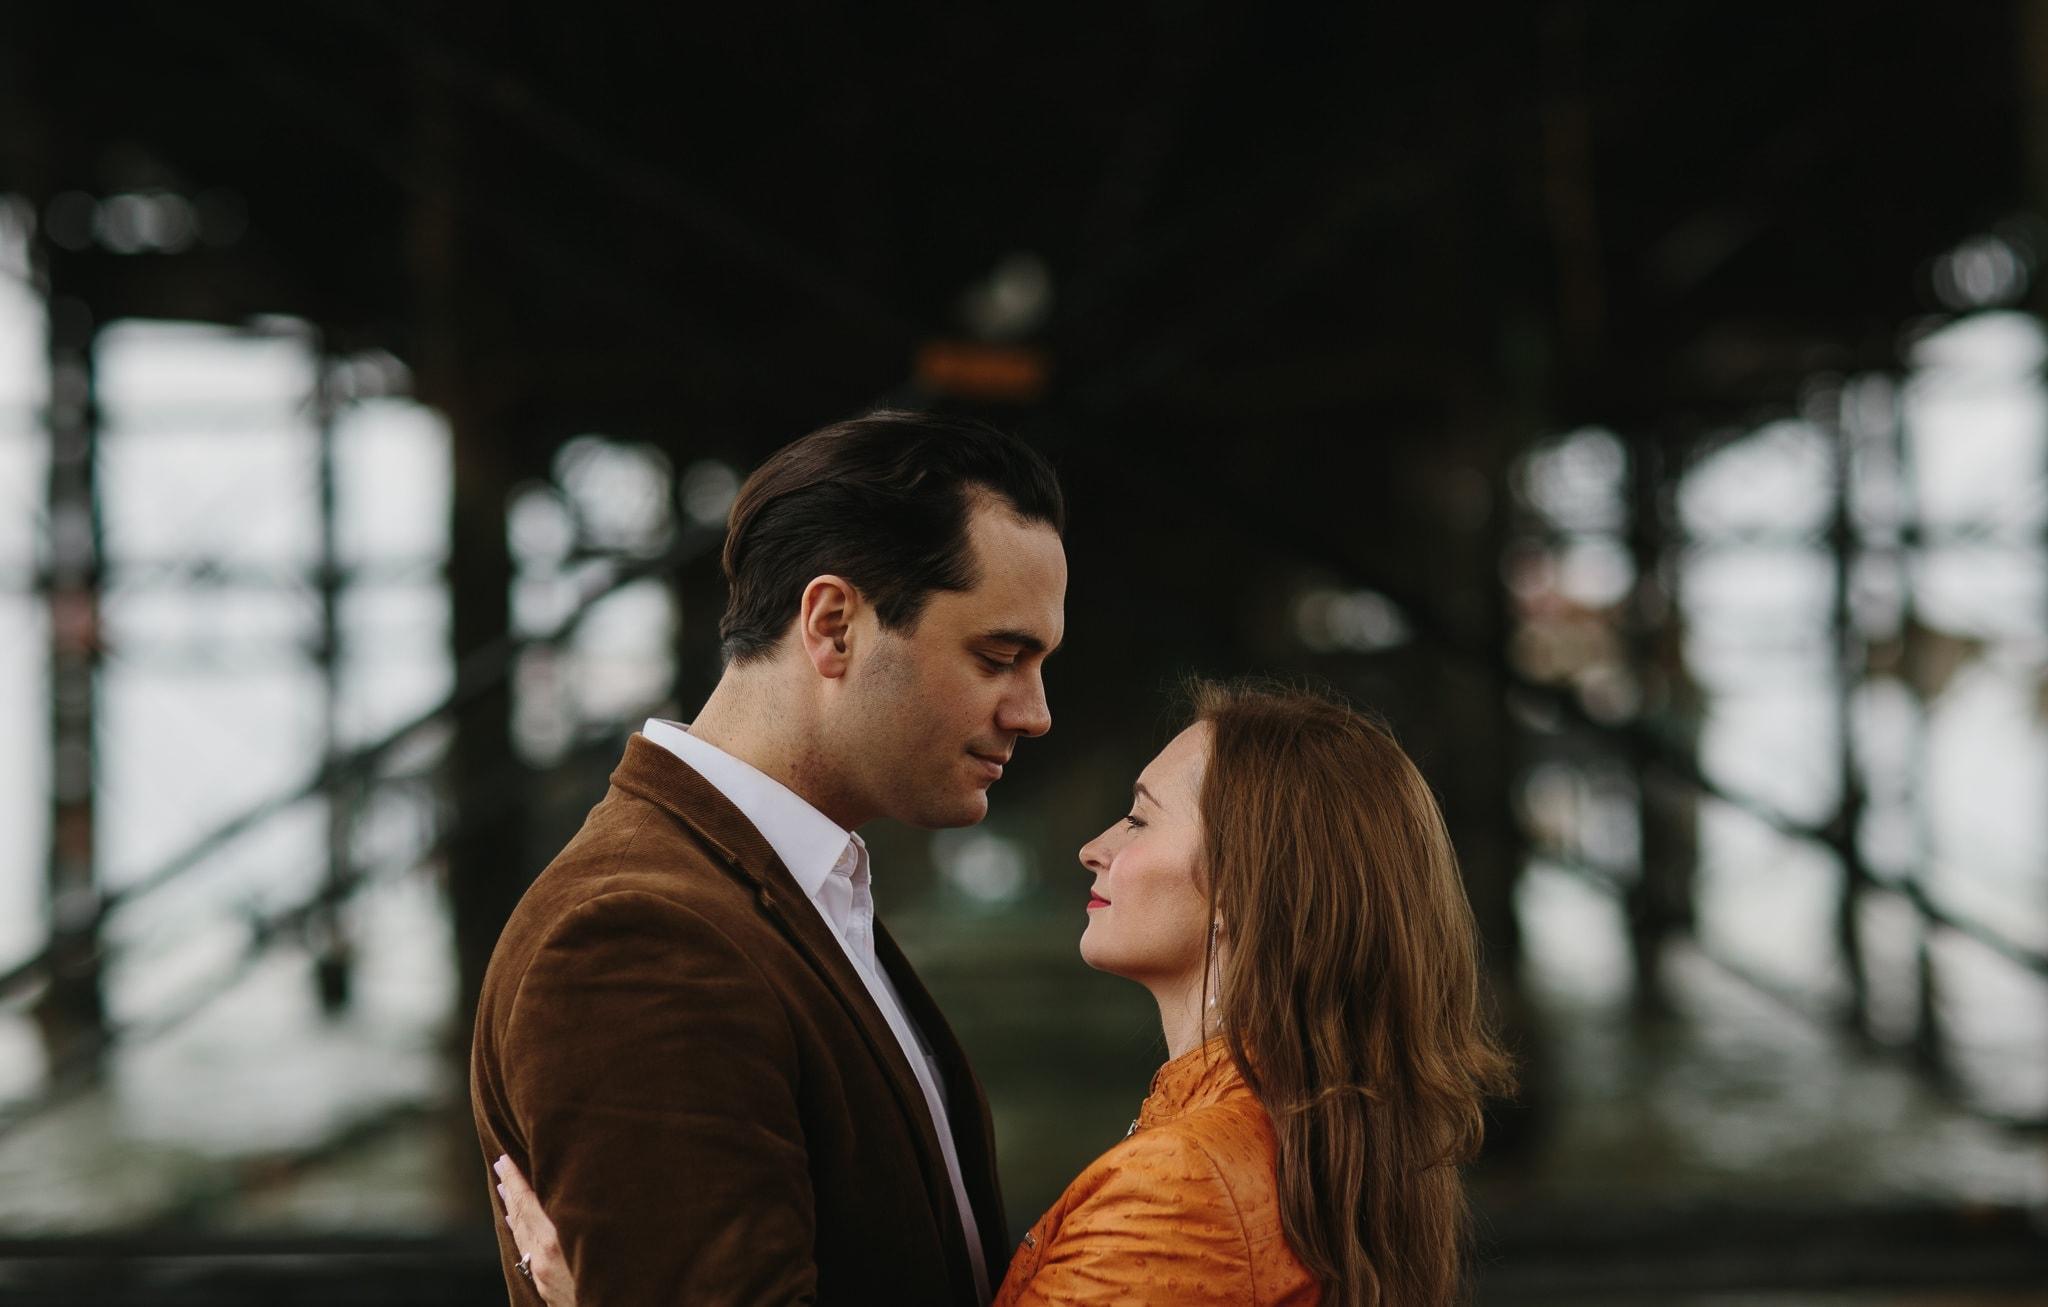 Beach Wedding and Engagement Photographer UK 2